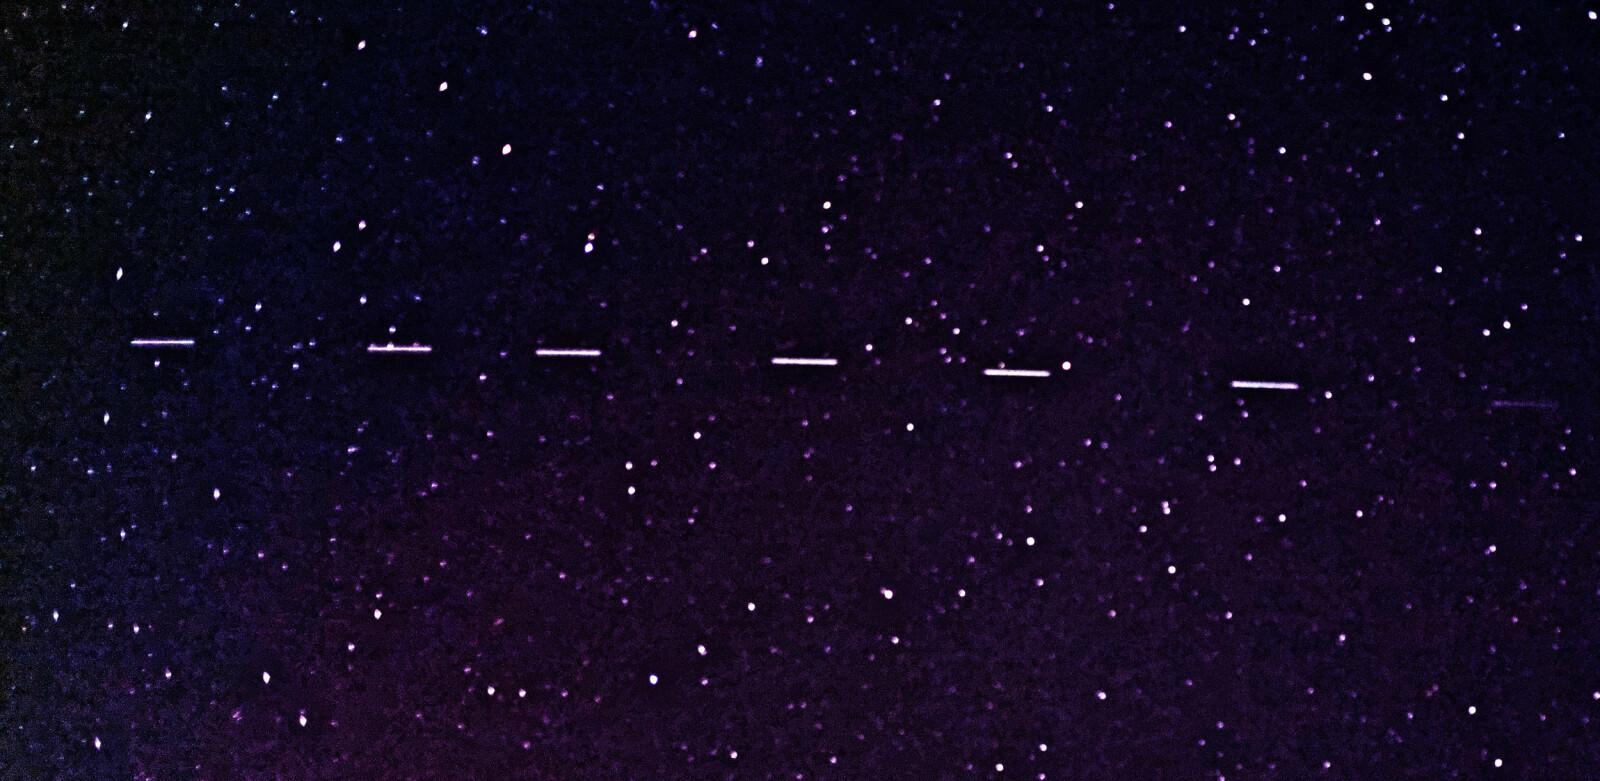 Starlink-satellitter i teleskopfoto.